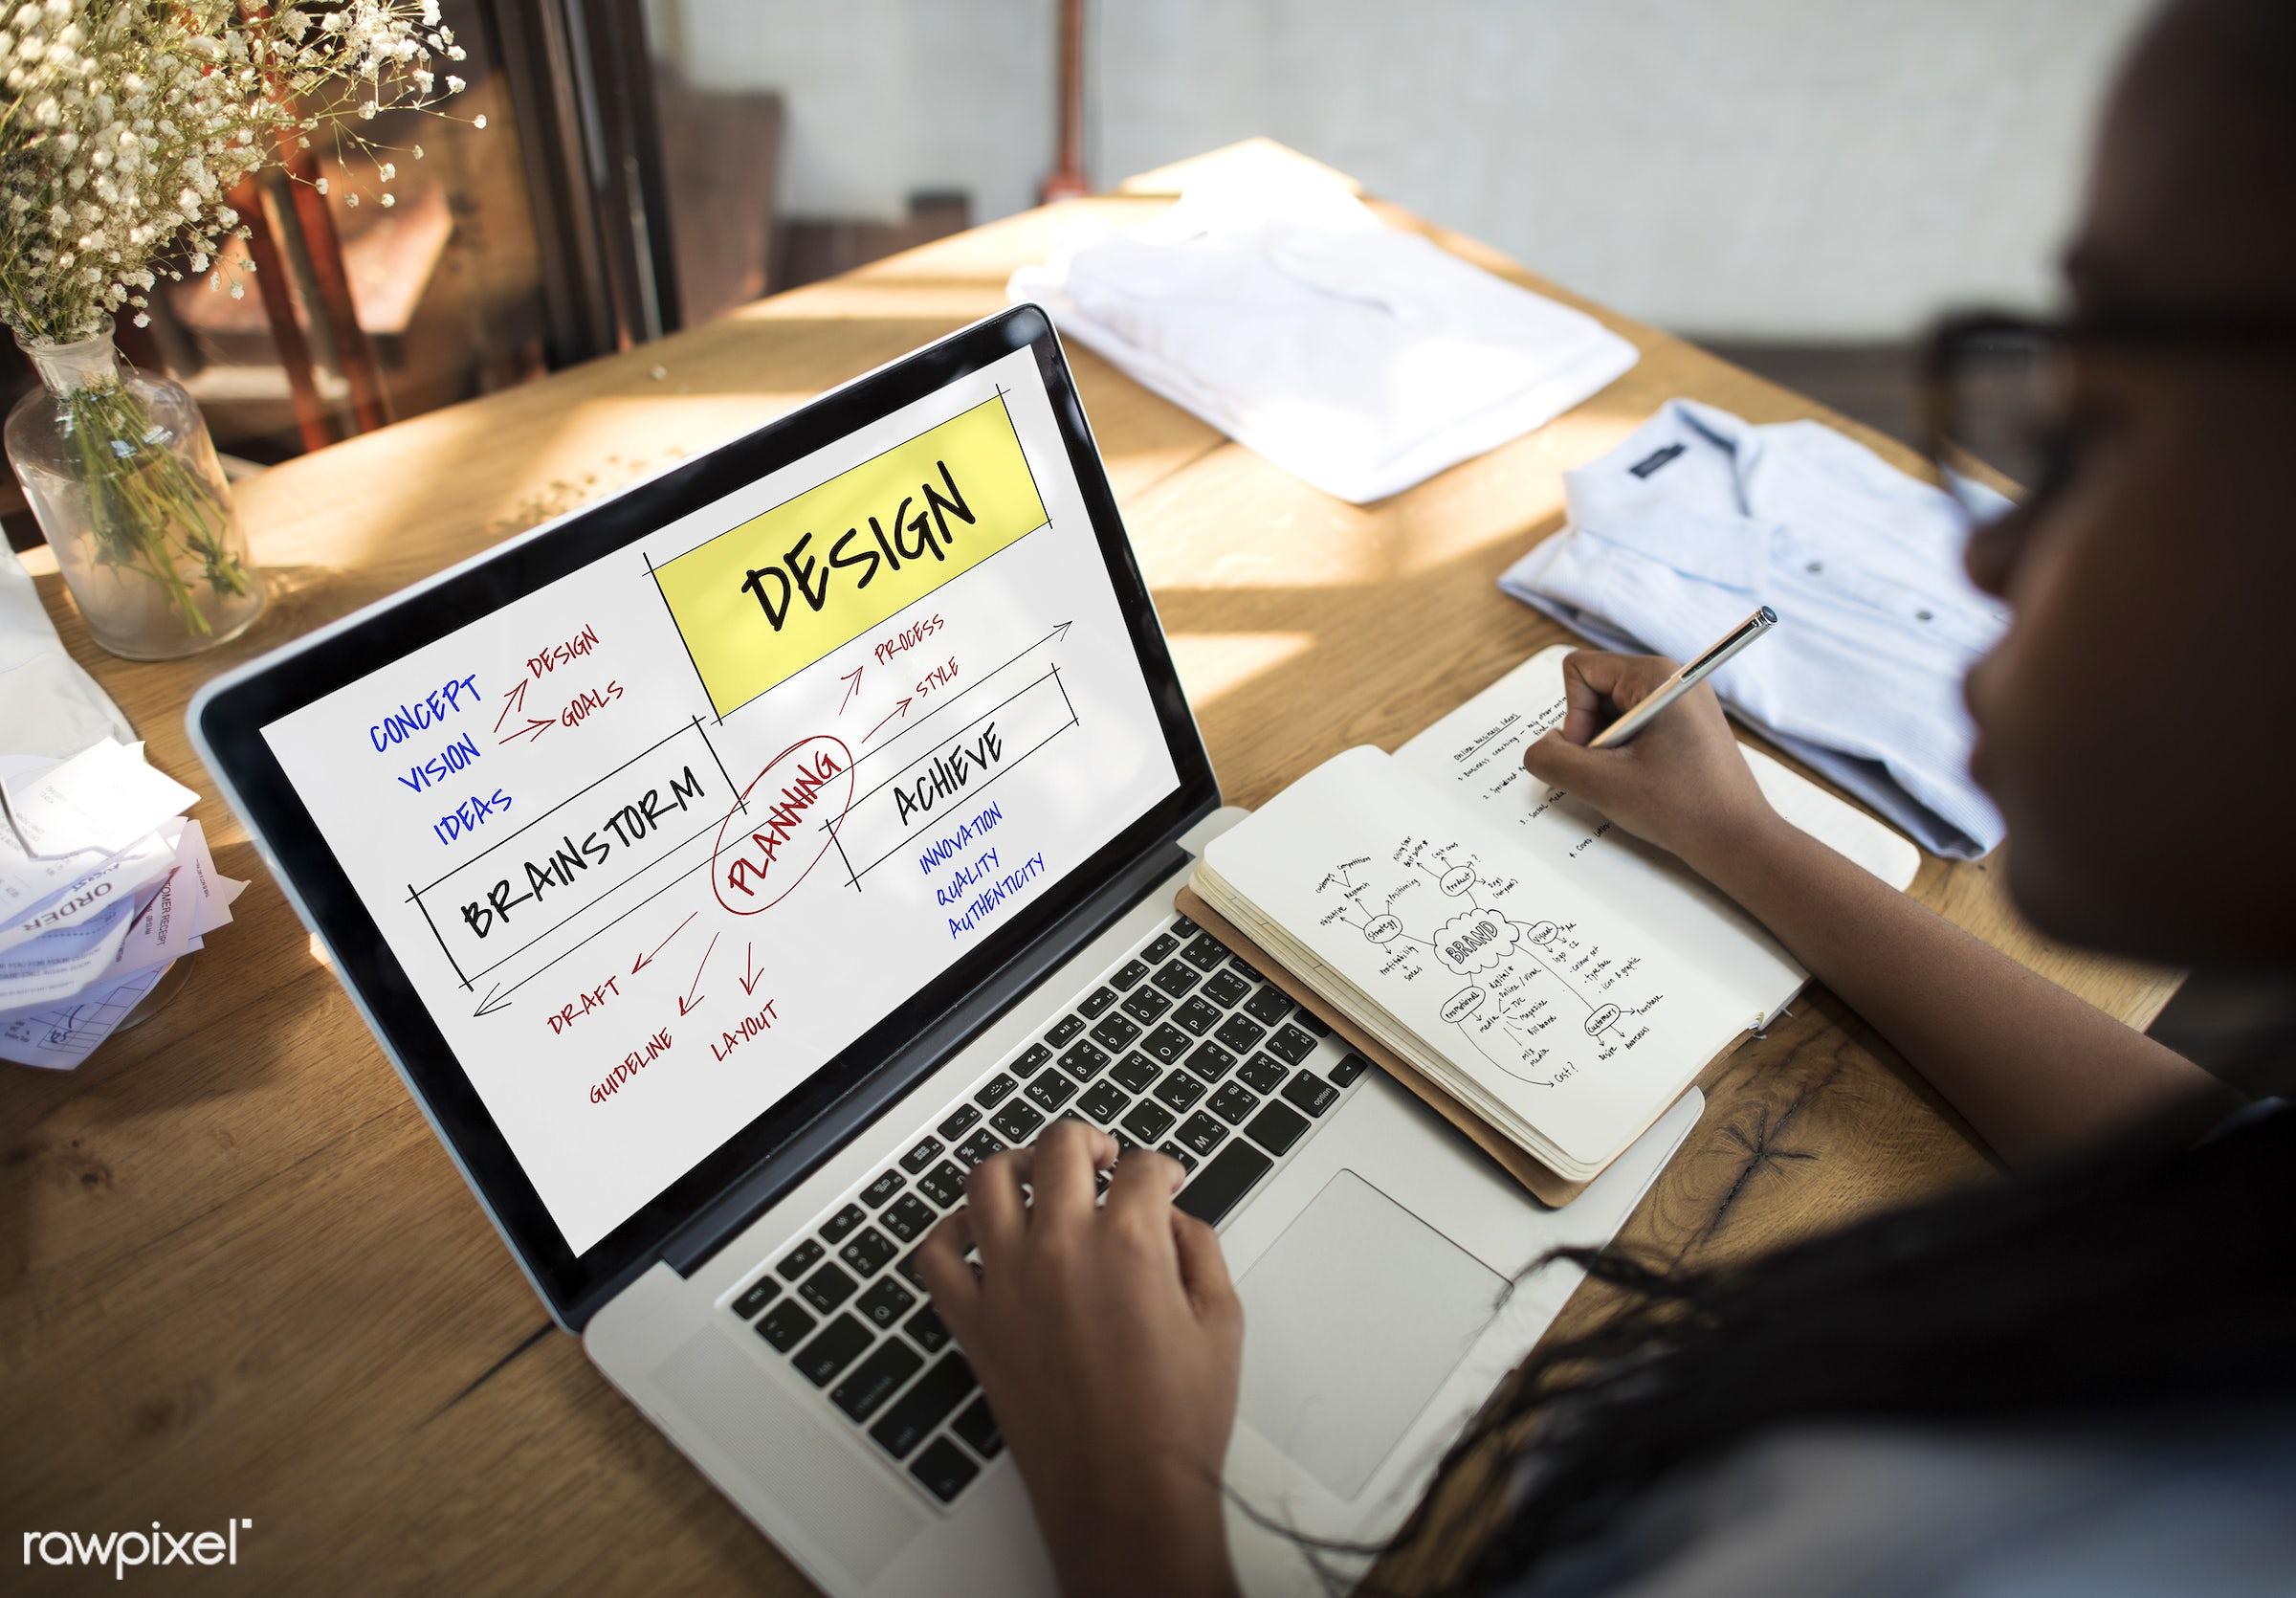 achieve, authenticity, back, browsing, coal, concept, design, device, digital, digital device, draft, fresh ideas, goals,...